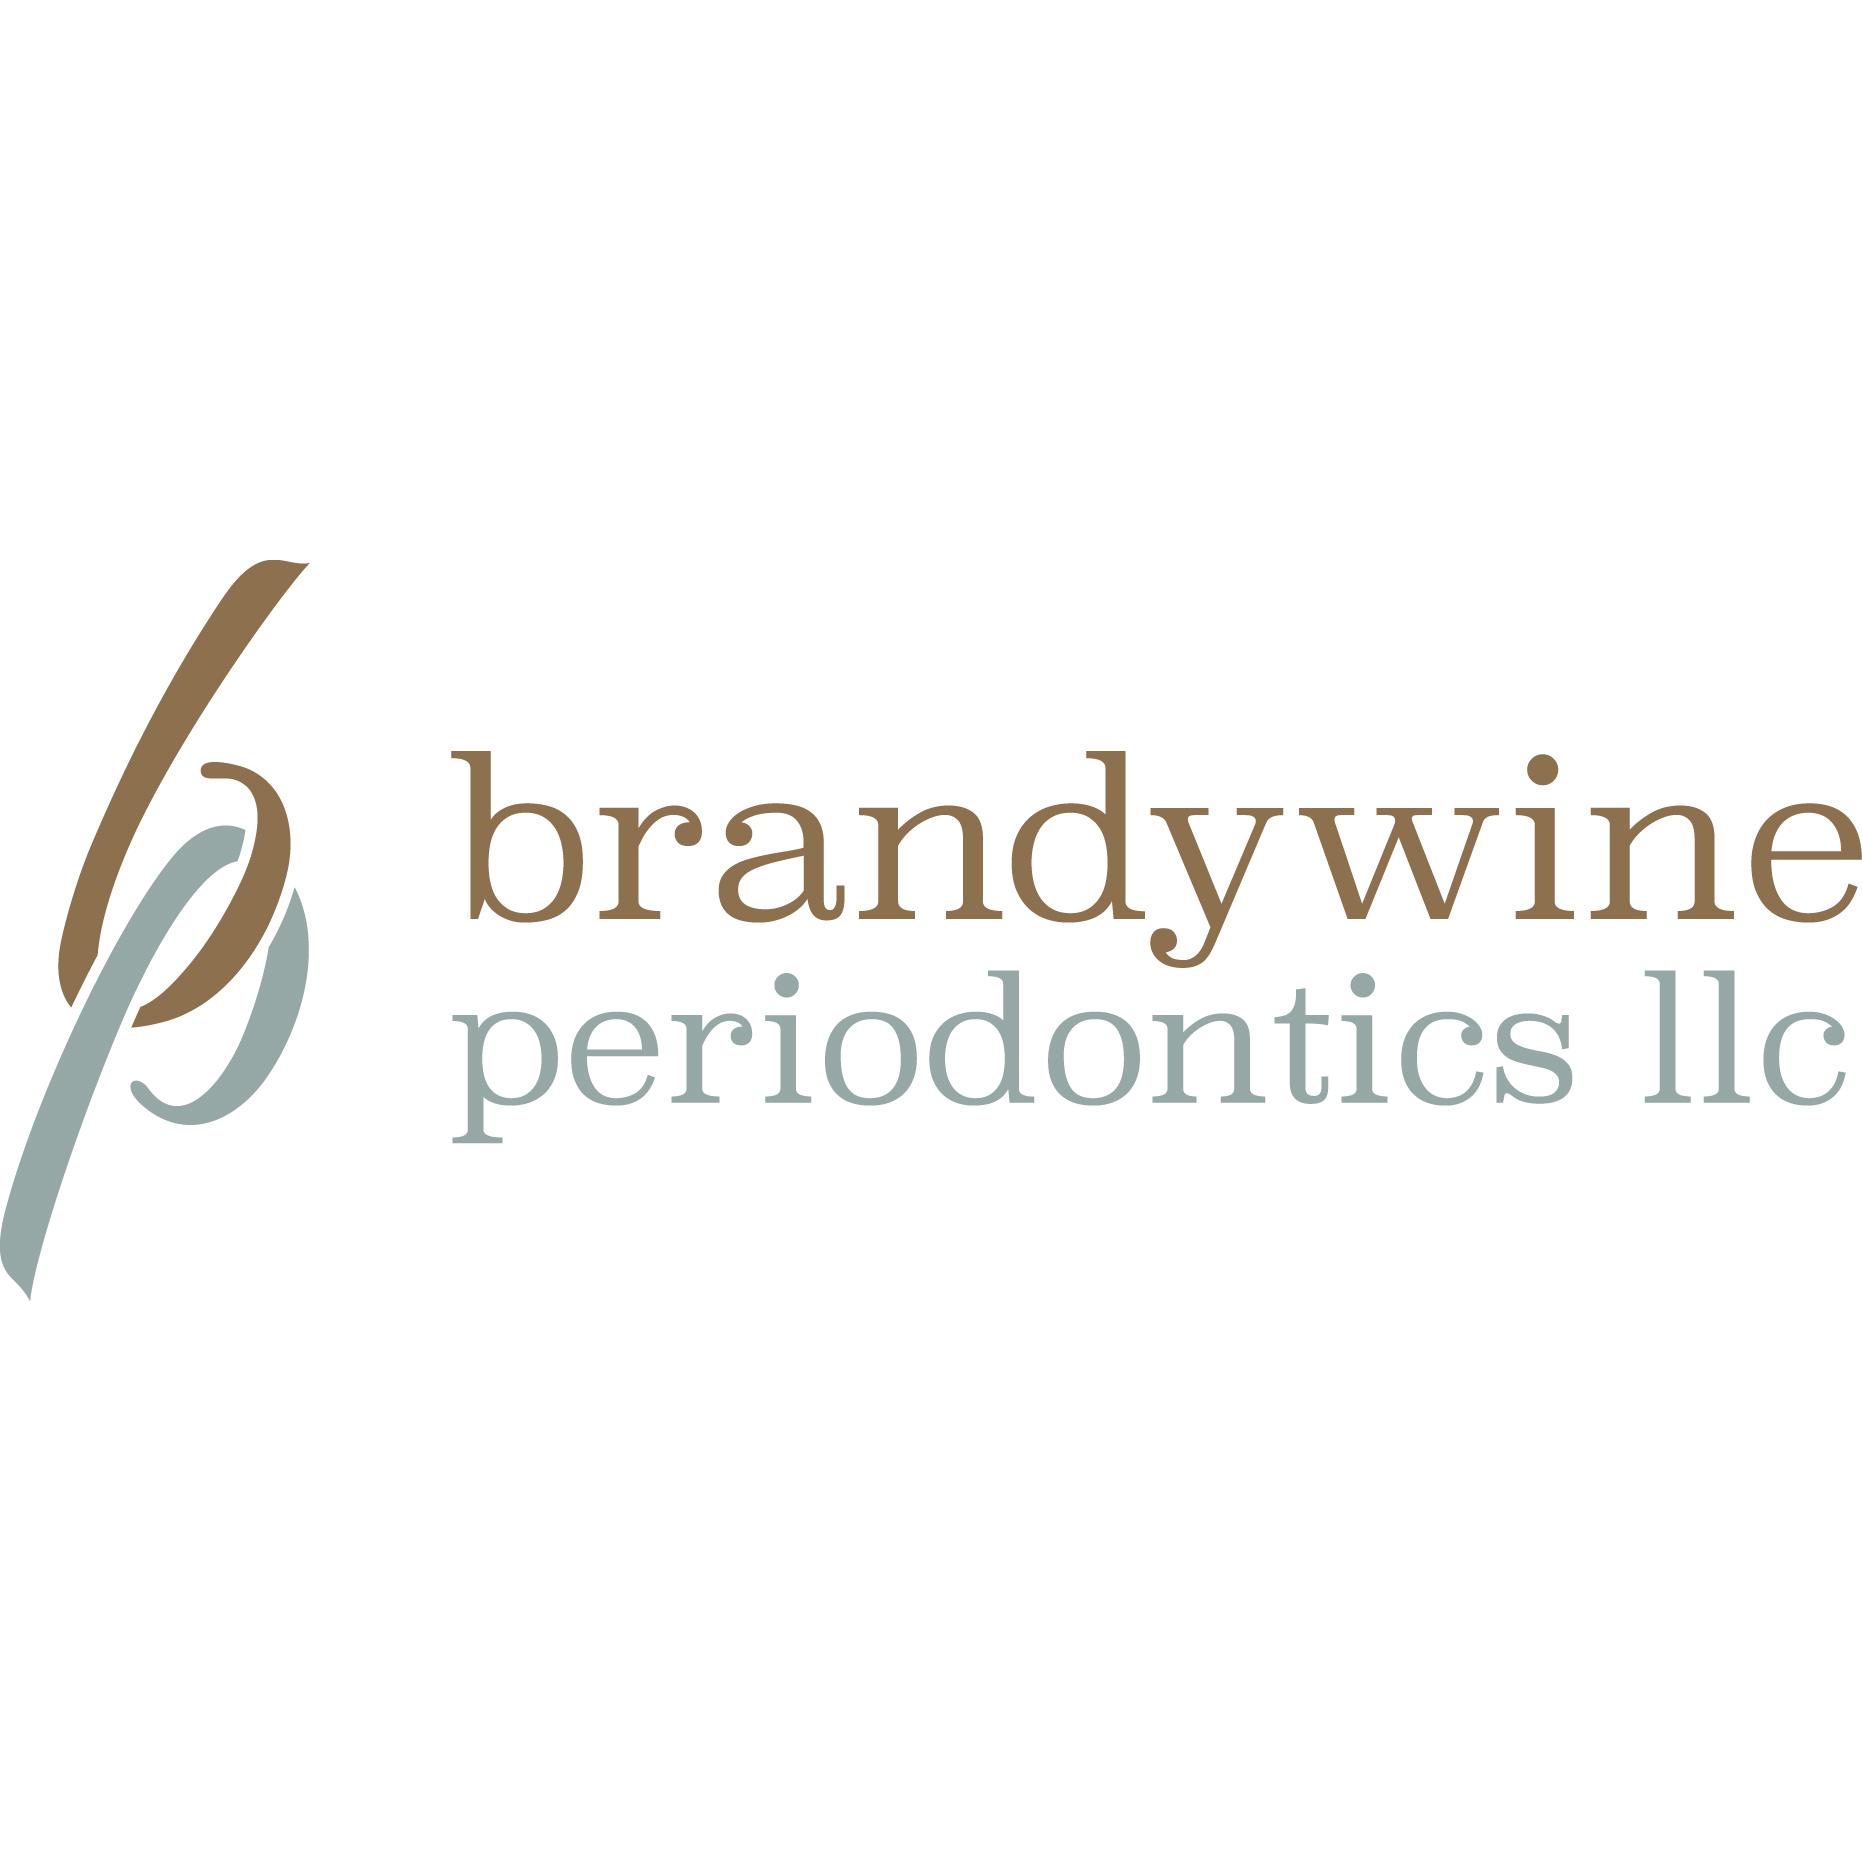 Brandywine Periodontics, LLC - Glen Mills, PA 19342 - (610)558-8283 | ShowMeLocal.com